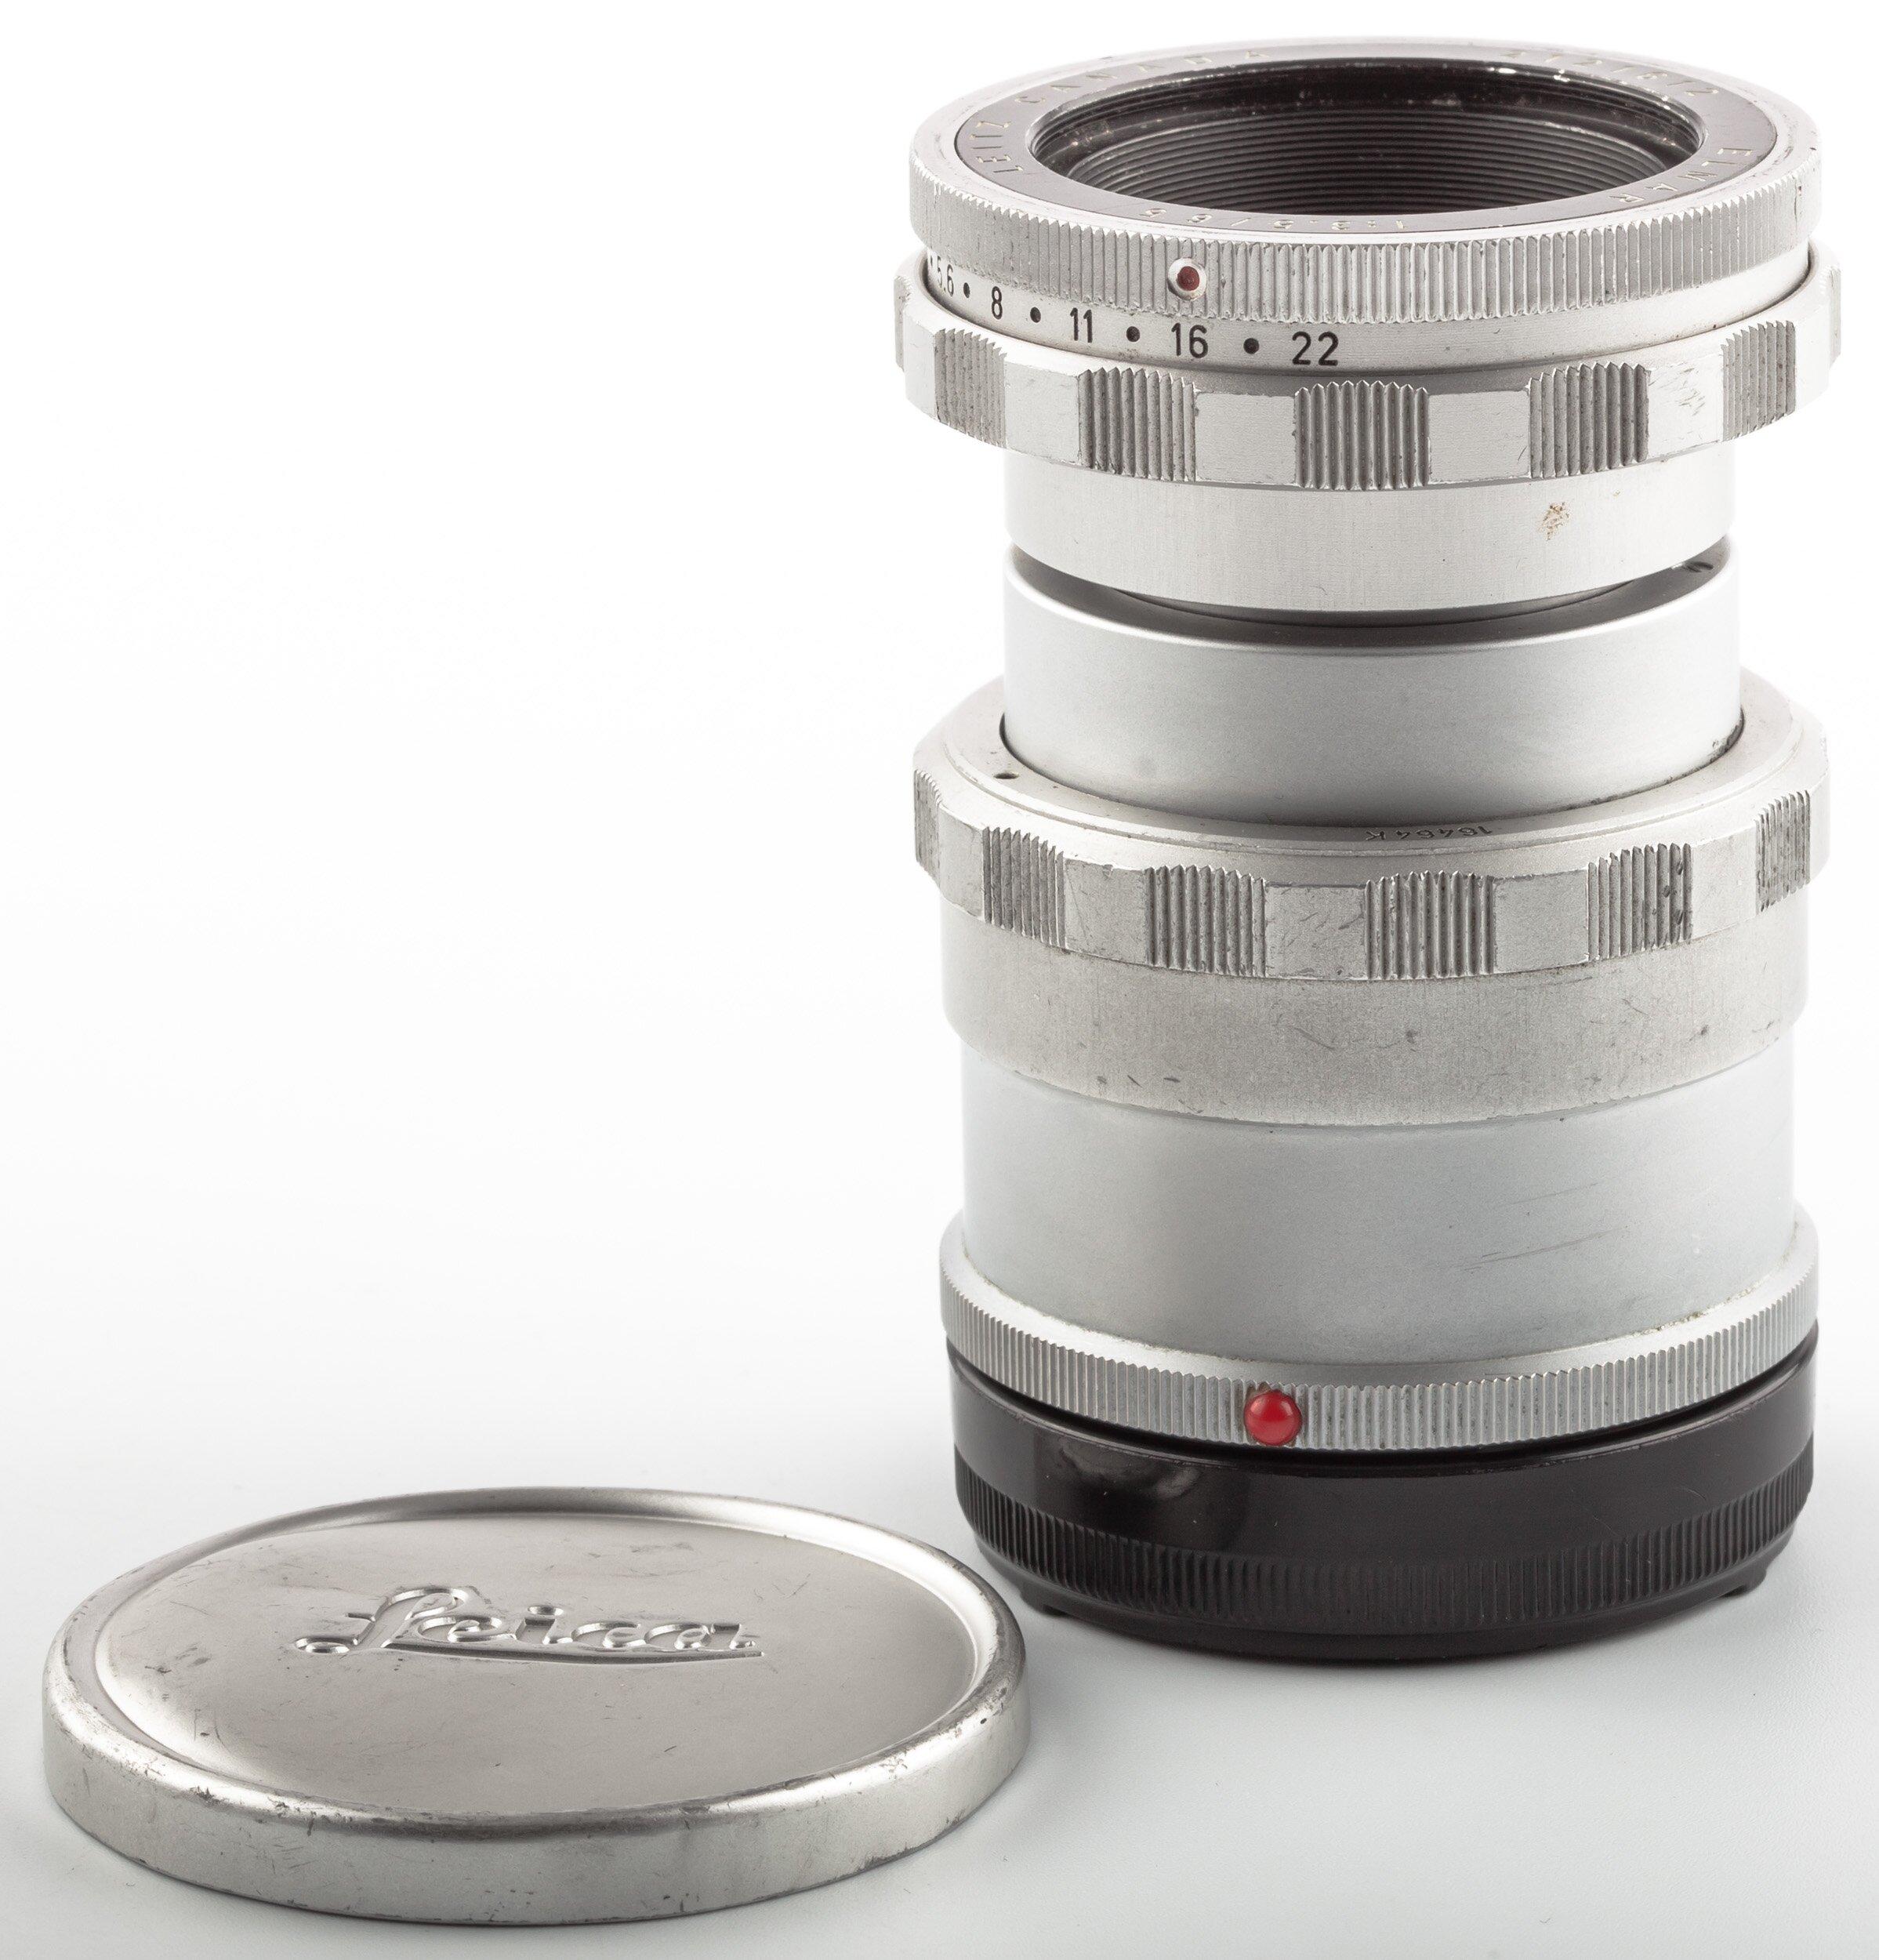 Leica Elmar 3,5/65mm Visoflex Macro #11062 mit Focus Mount All #16464k